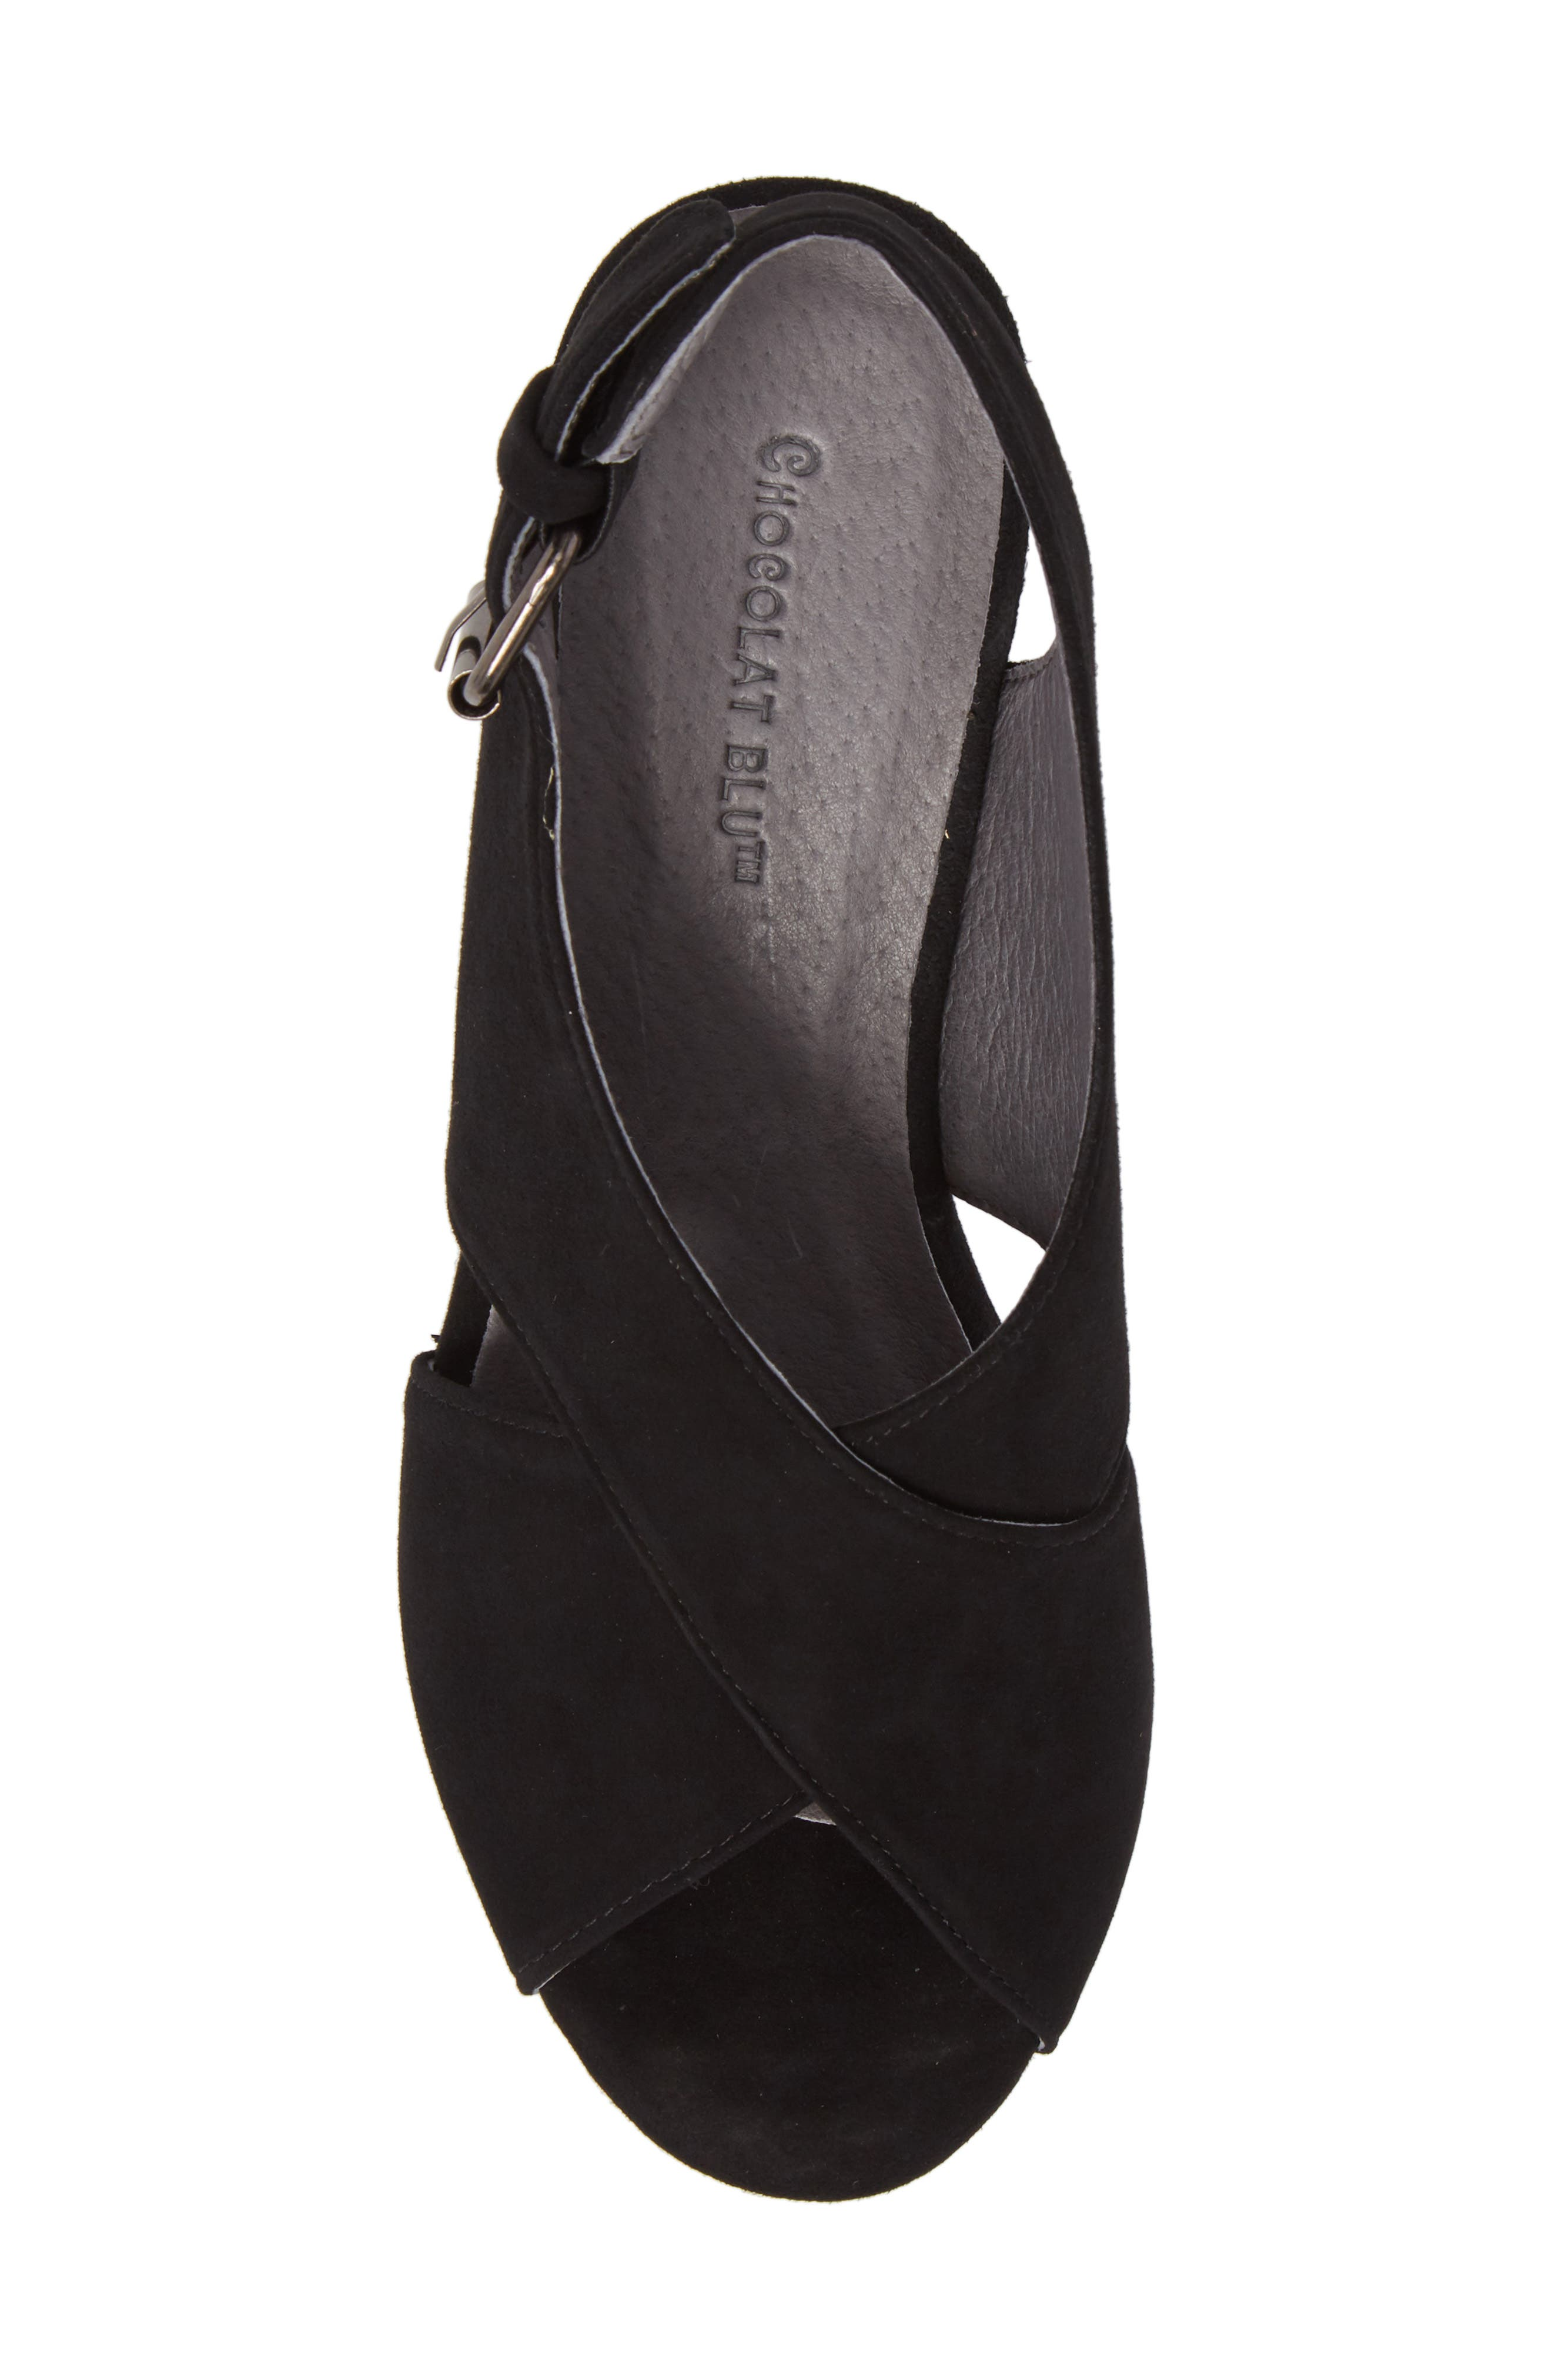 Wim Platform Wedge Sandal,                             Alternate thumbnail 5, color,                             BLACK SUEDE